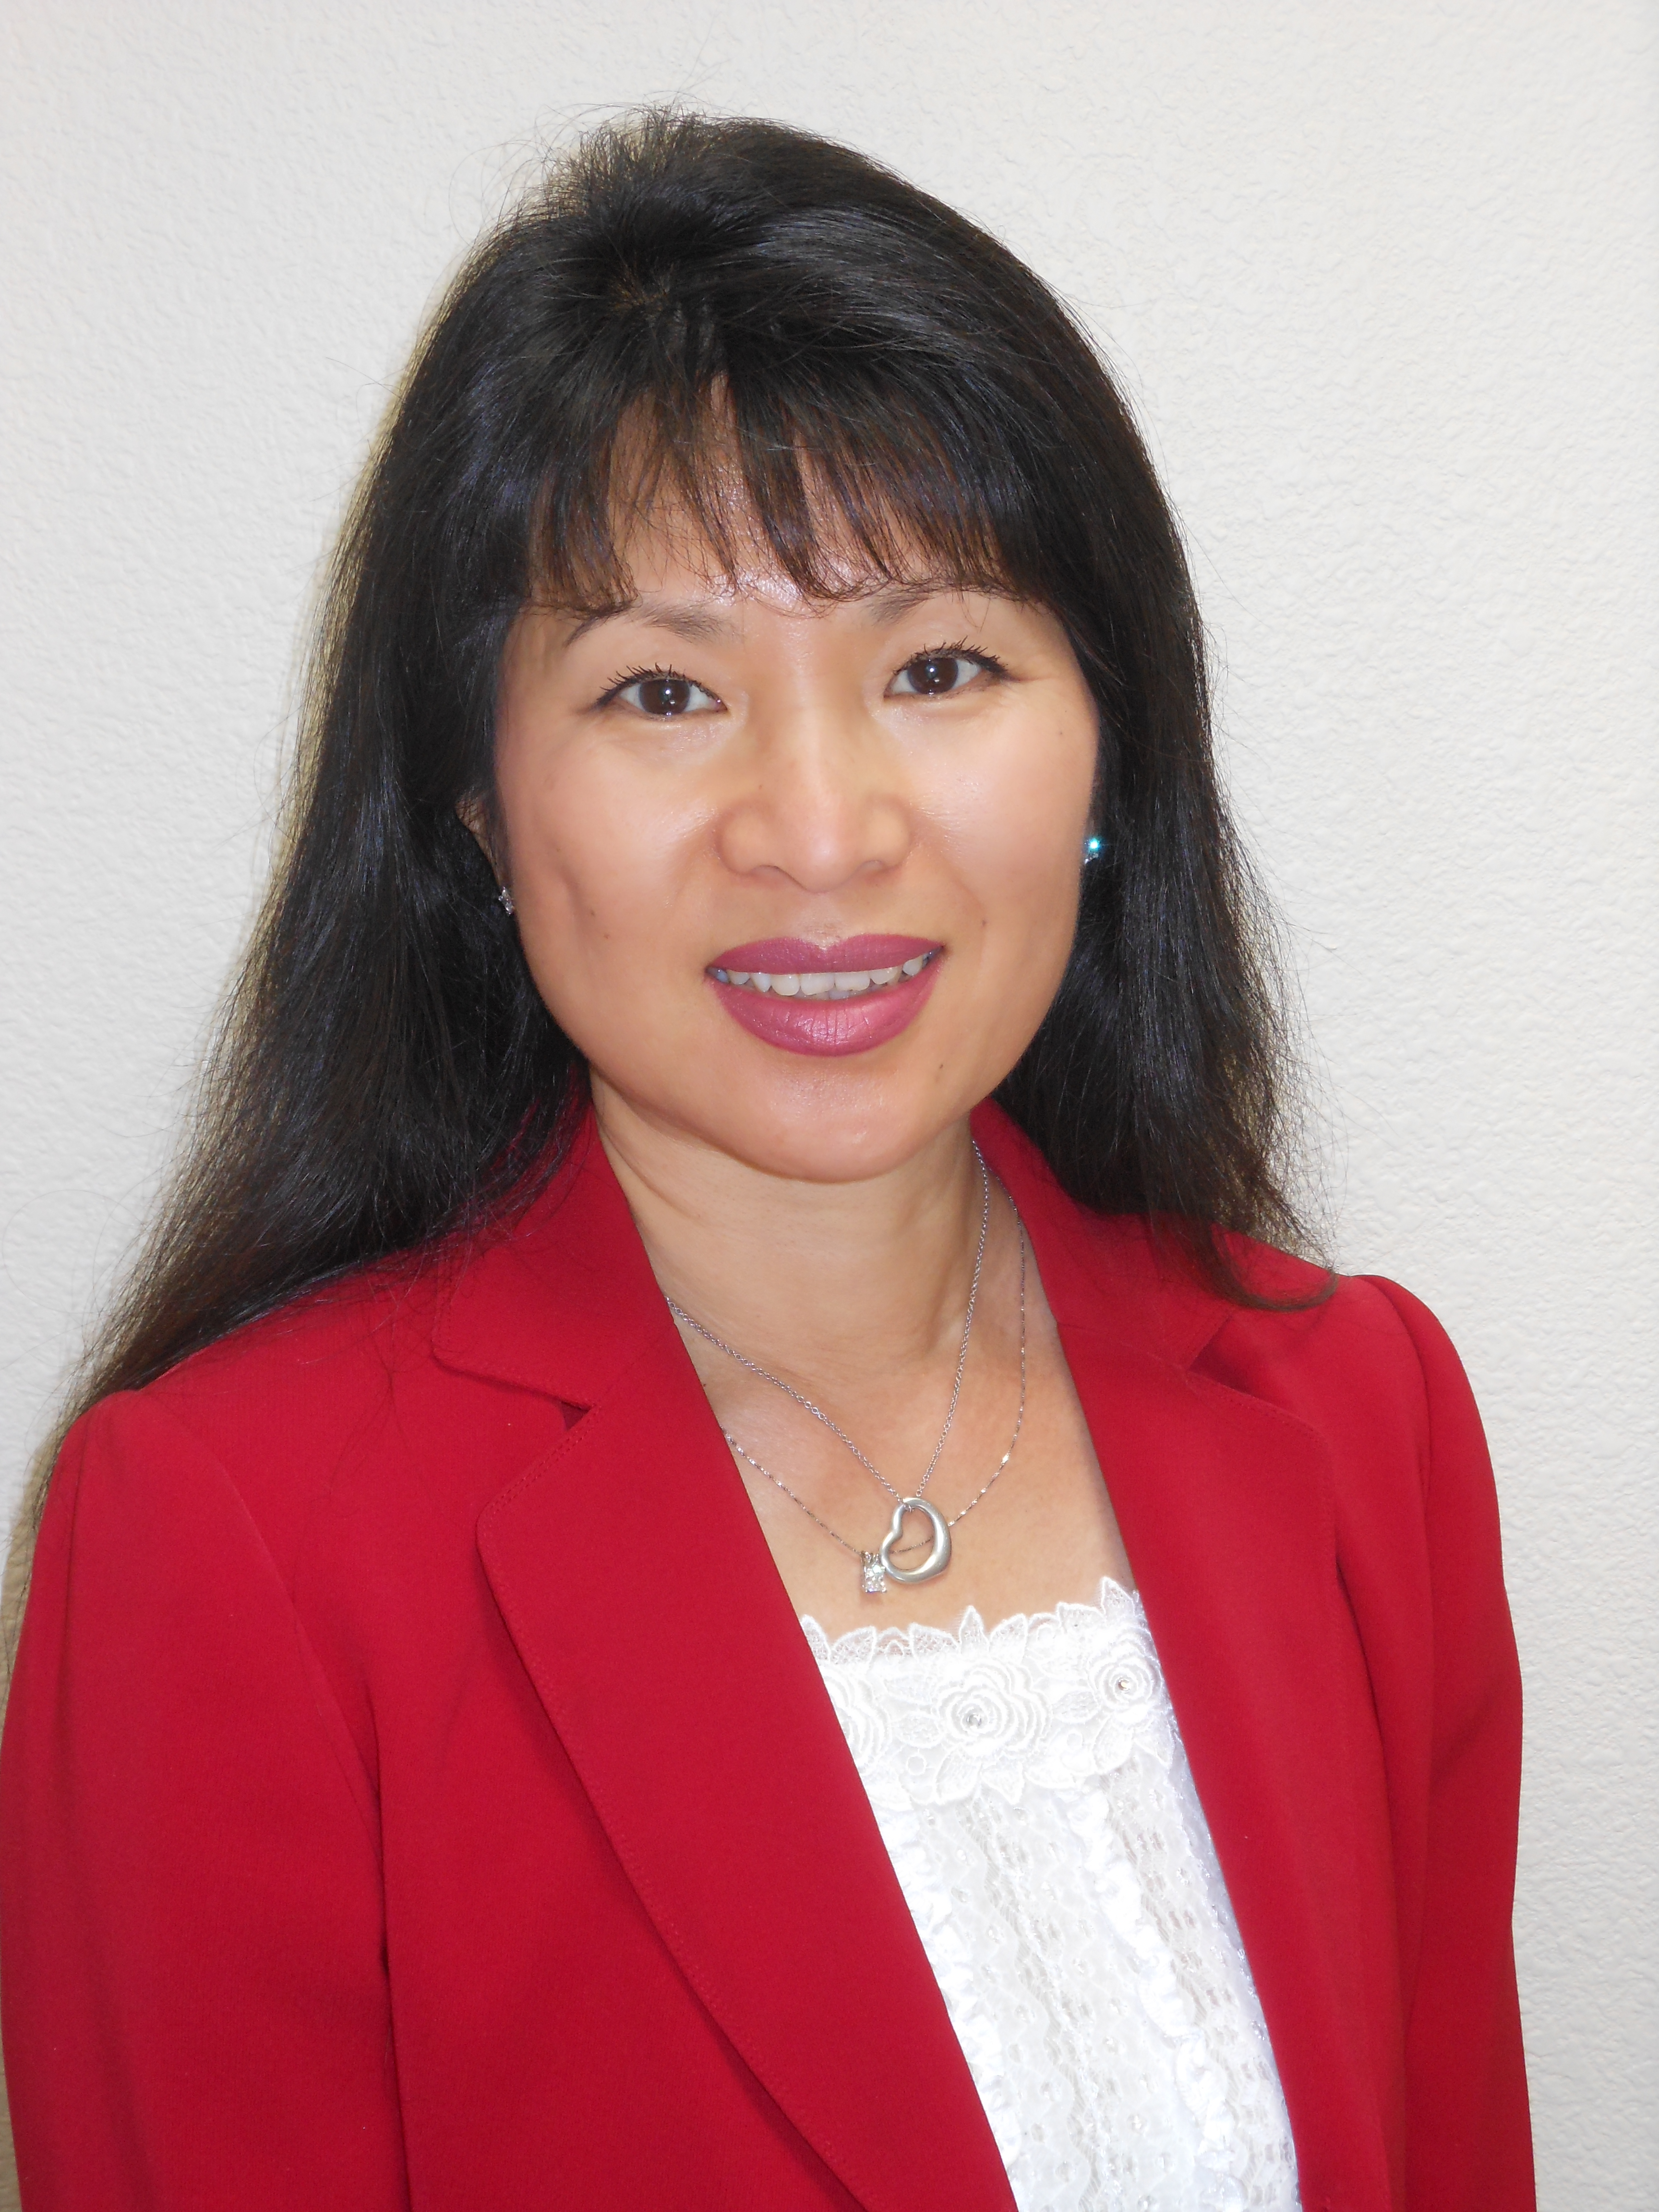 People & Properties Sotheby's International Realty Welcomes Tina Nerheim